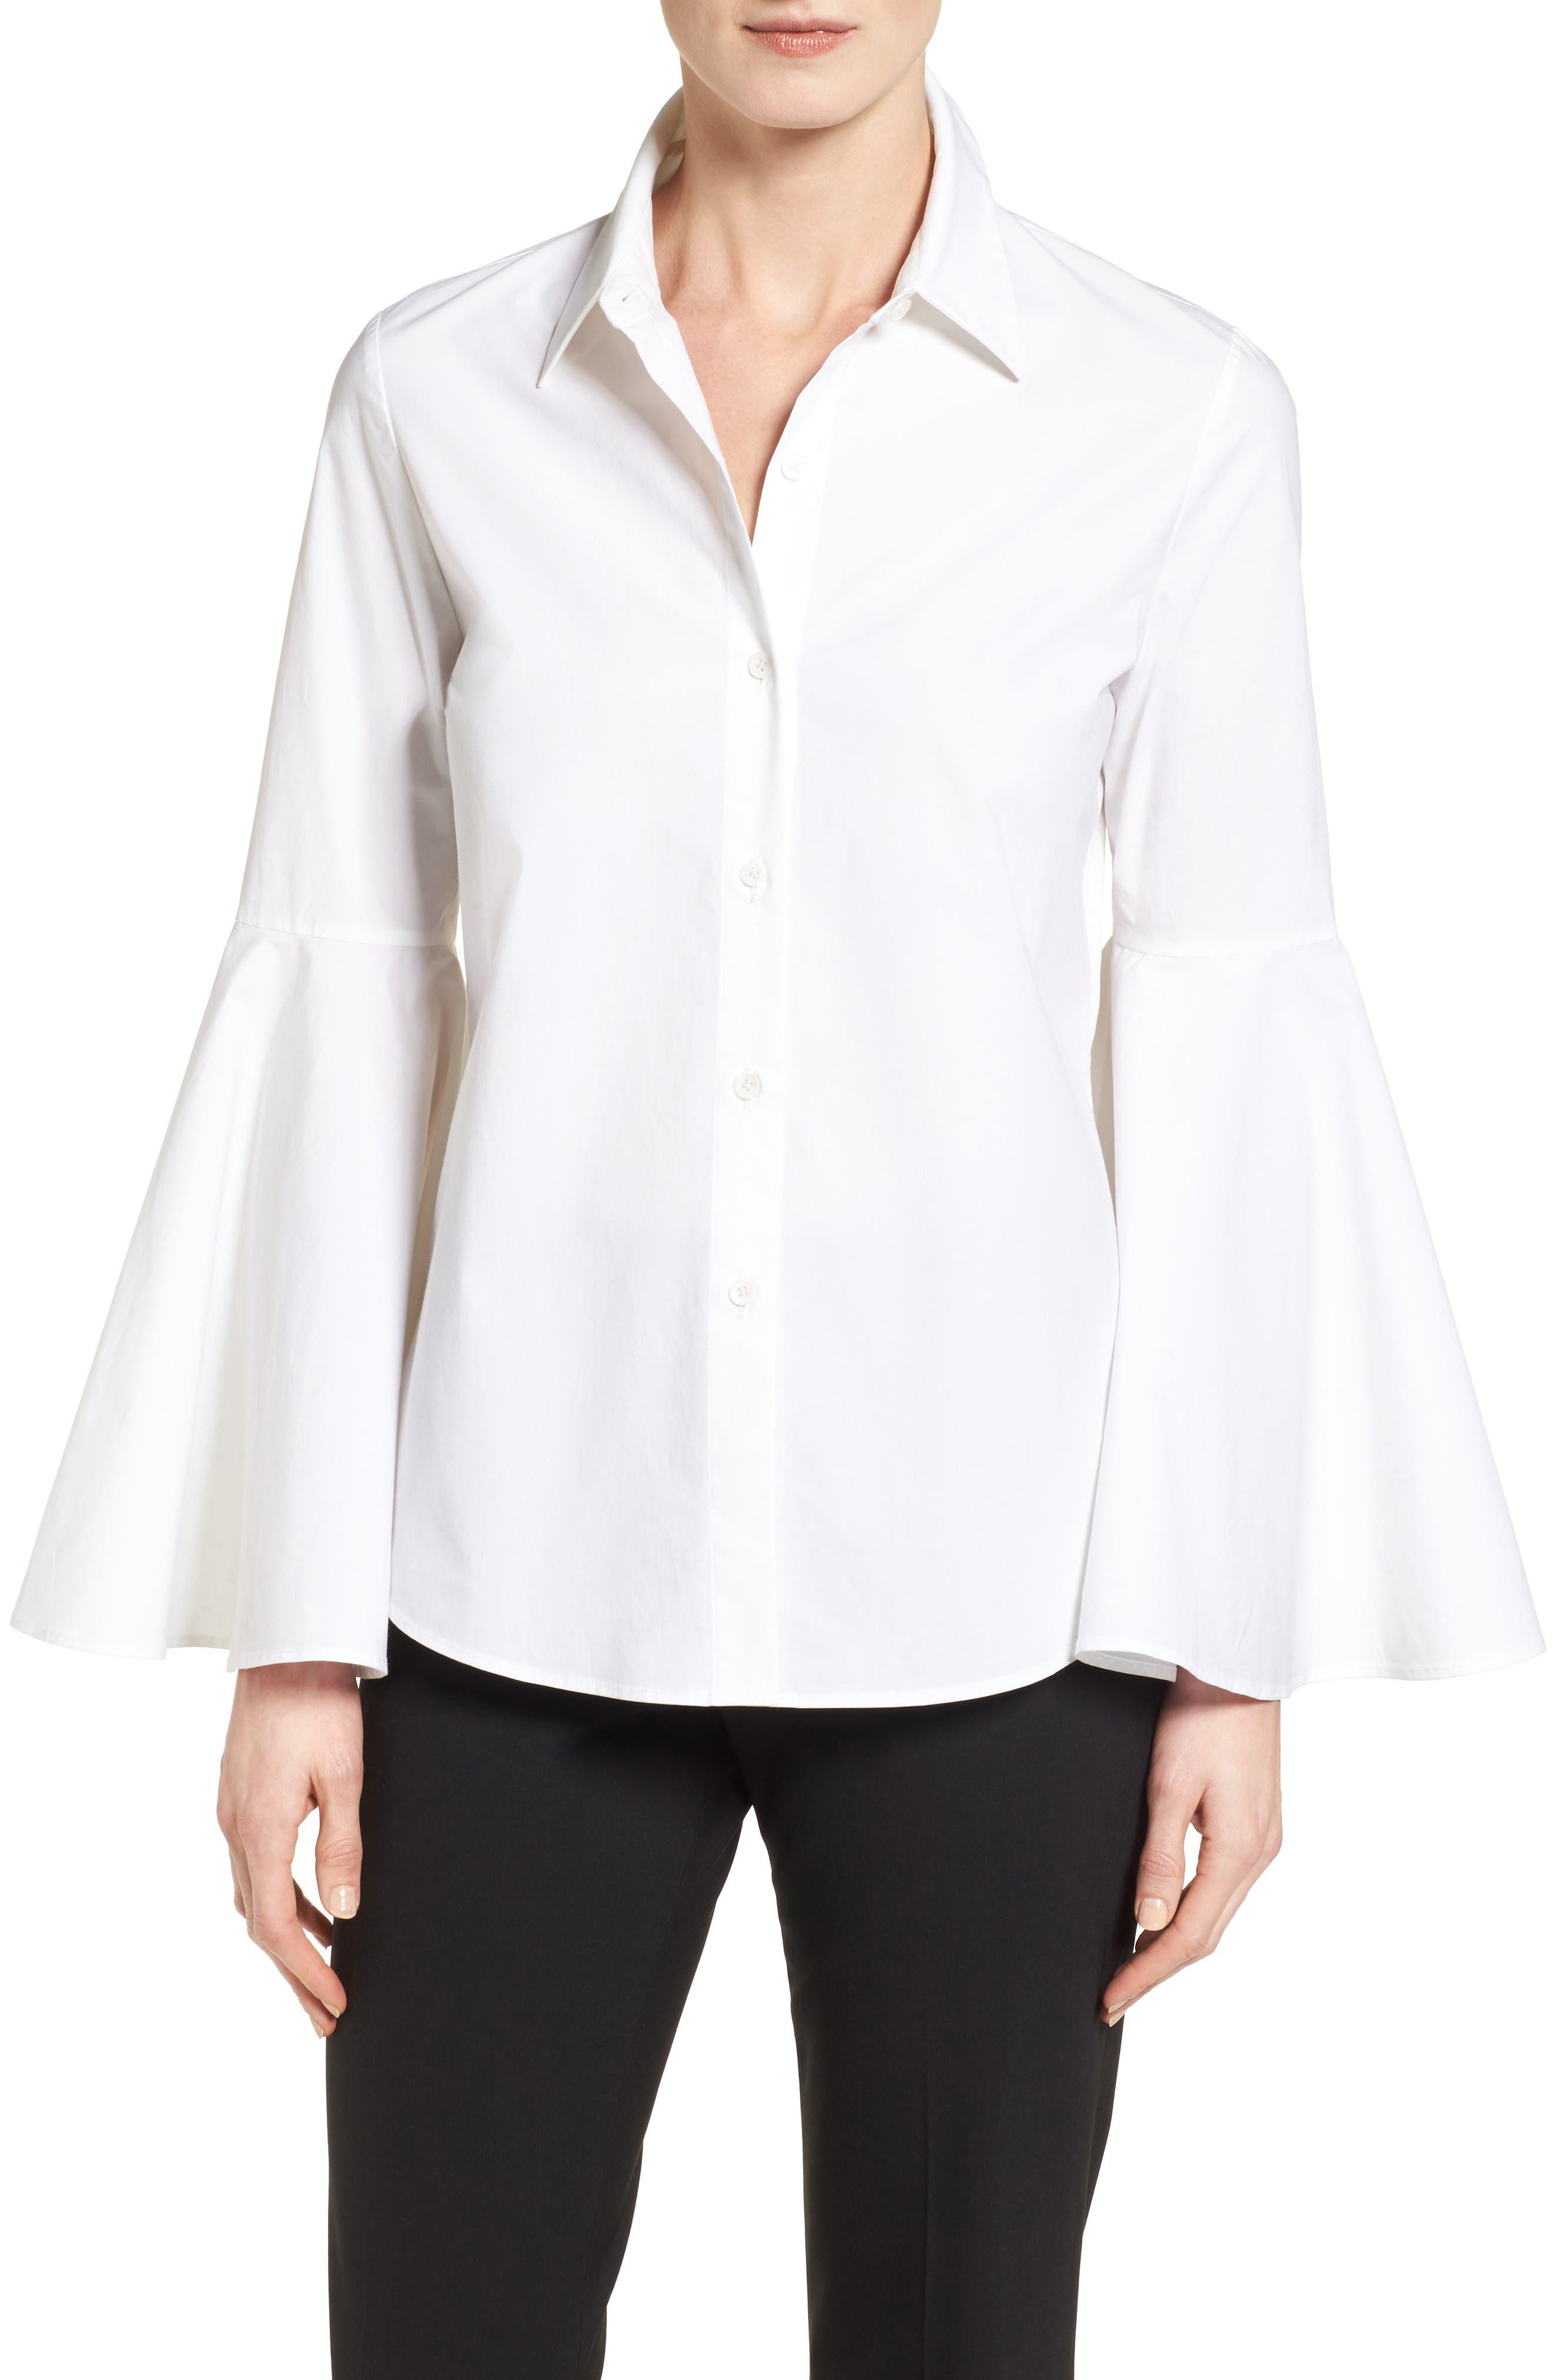 Main Image - Vince Camuto Bell Sleeve Shirt (Regular & Petite)